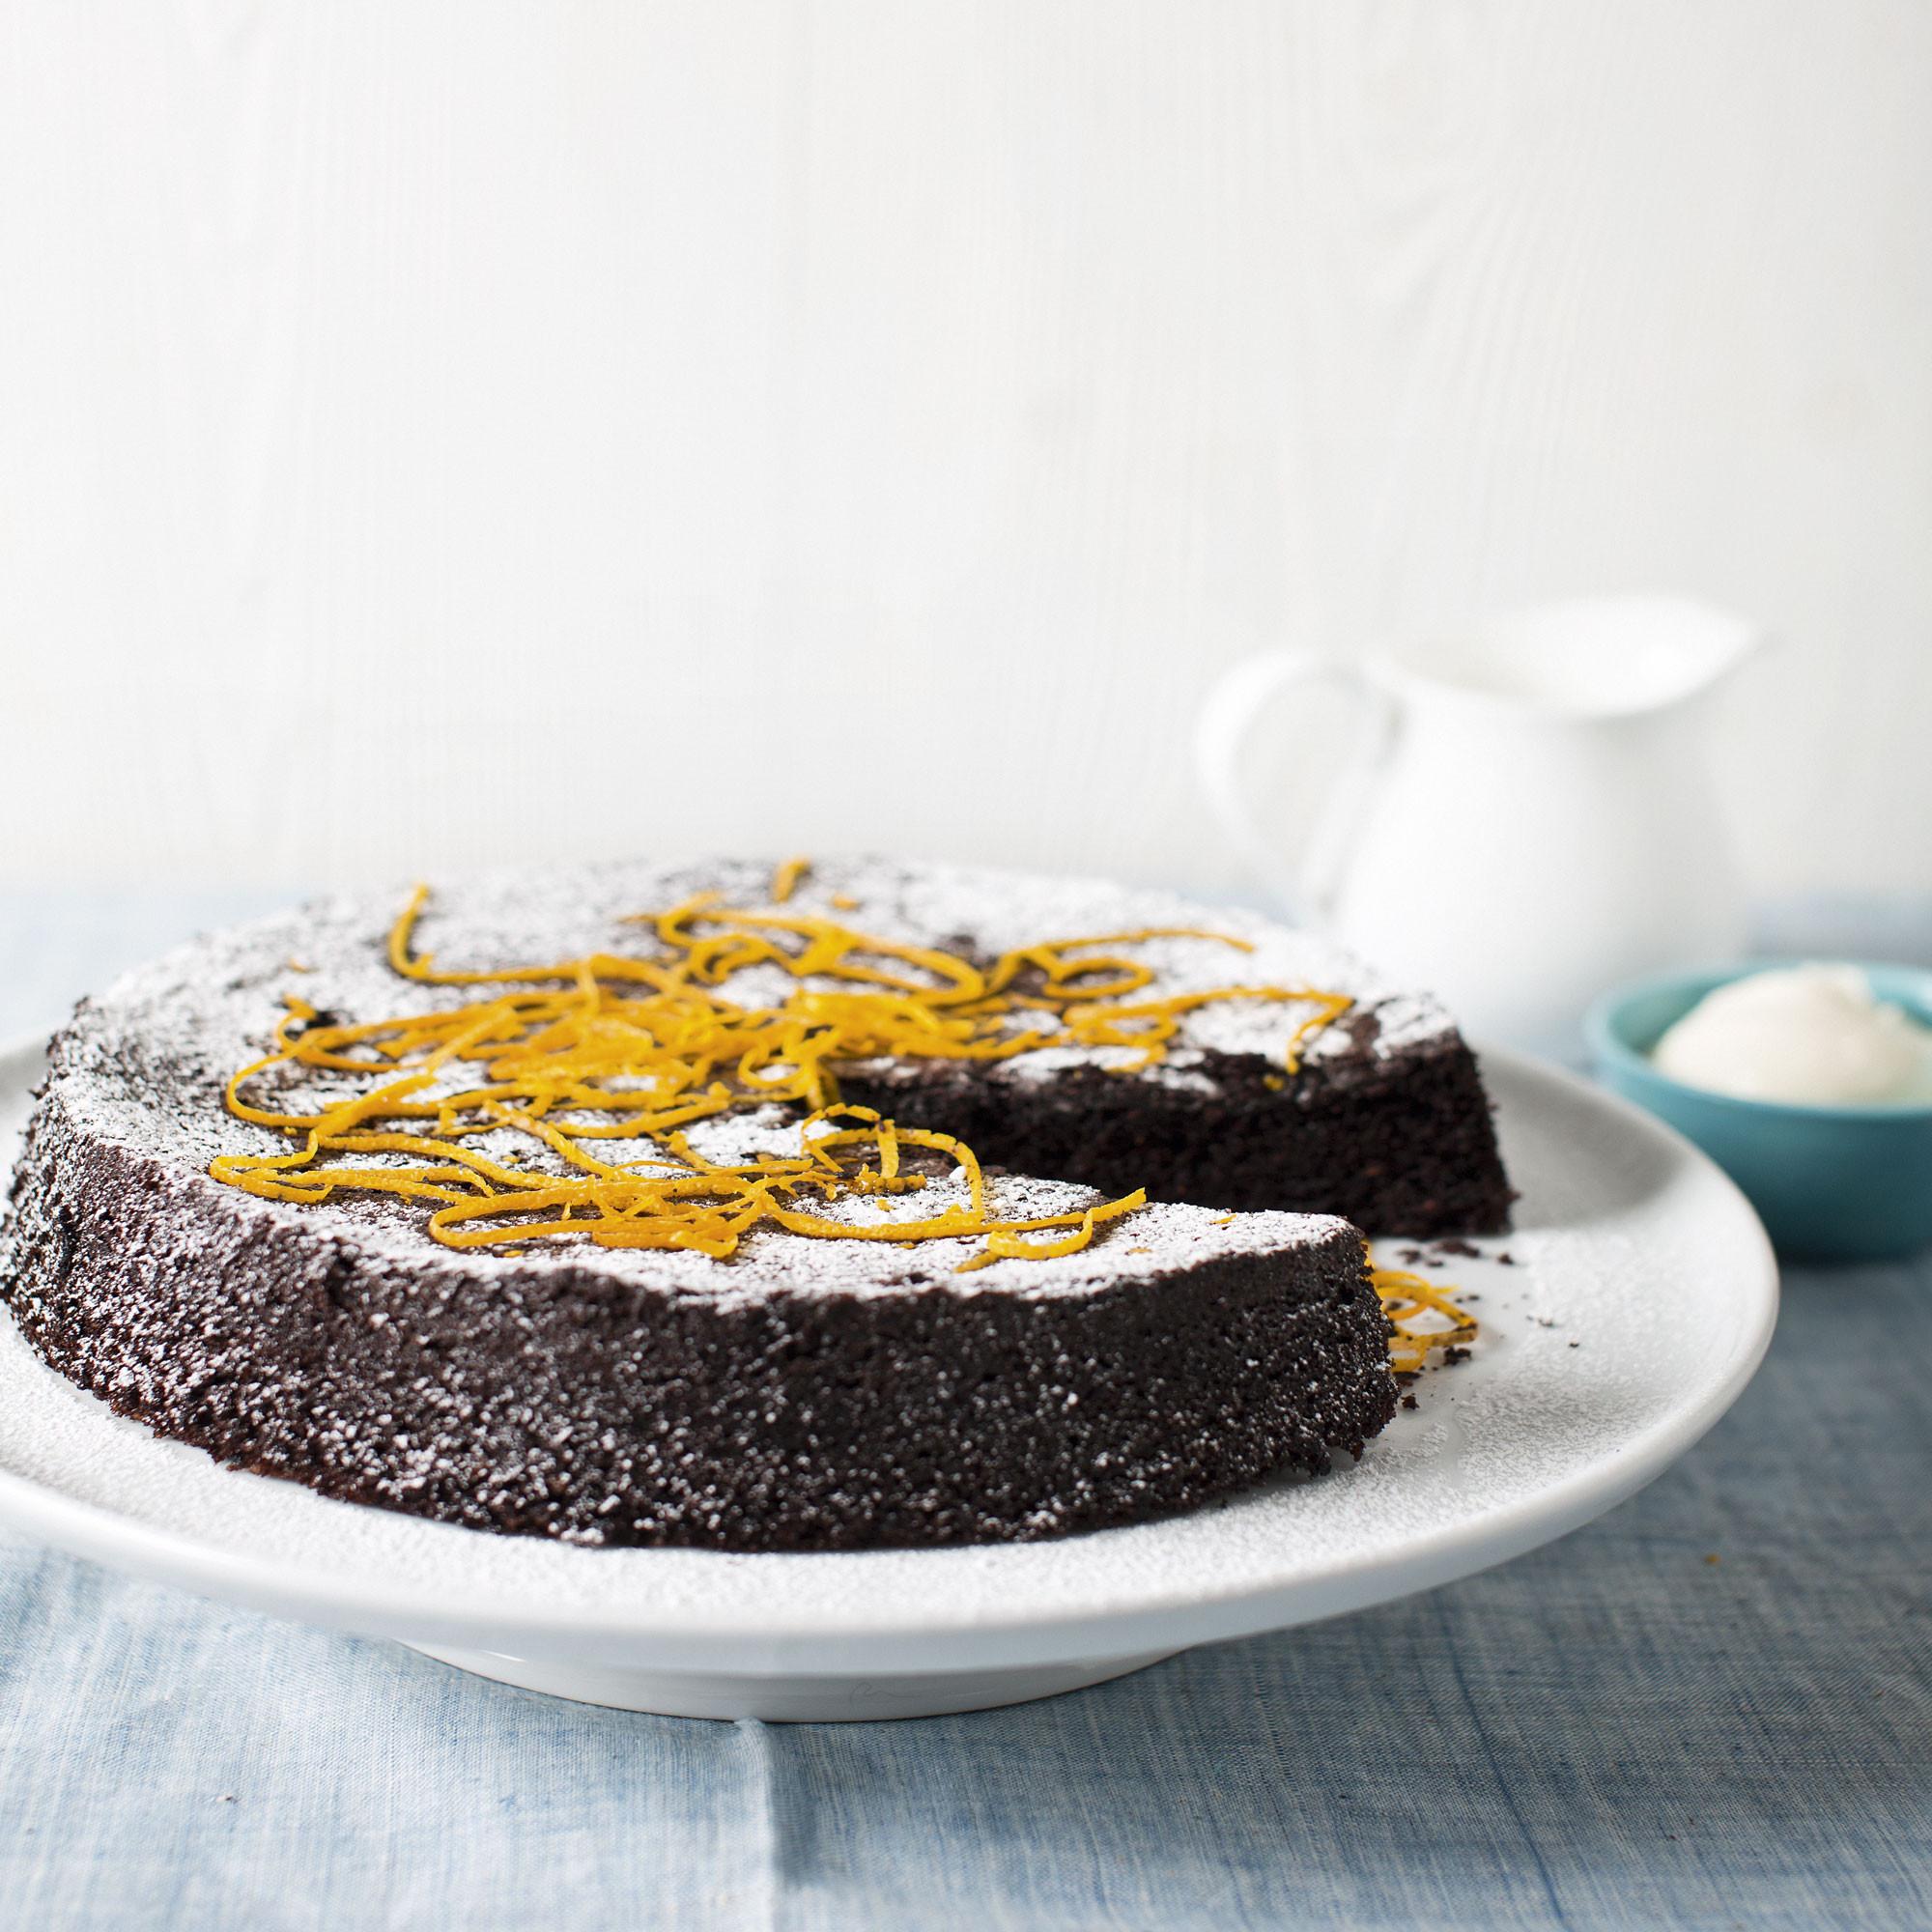 Orange Chocolate Cake  Homemade Pavlova with seasonal berries or fruit and dark